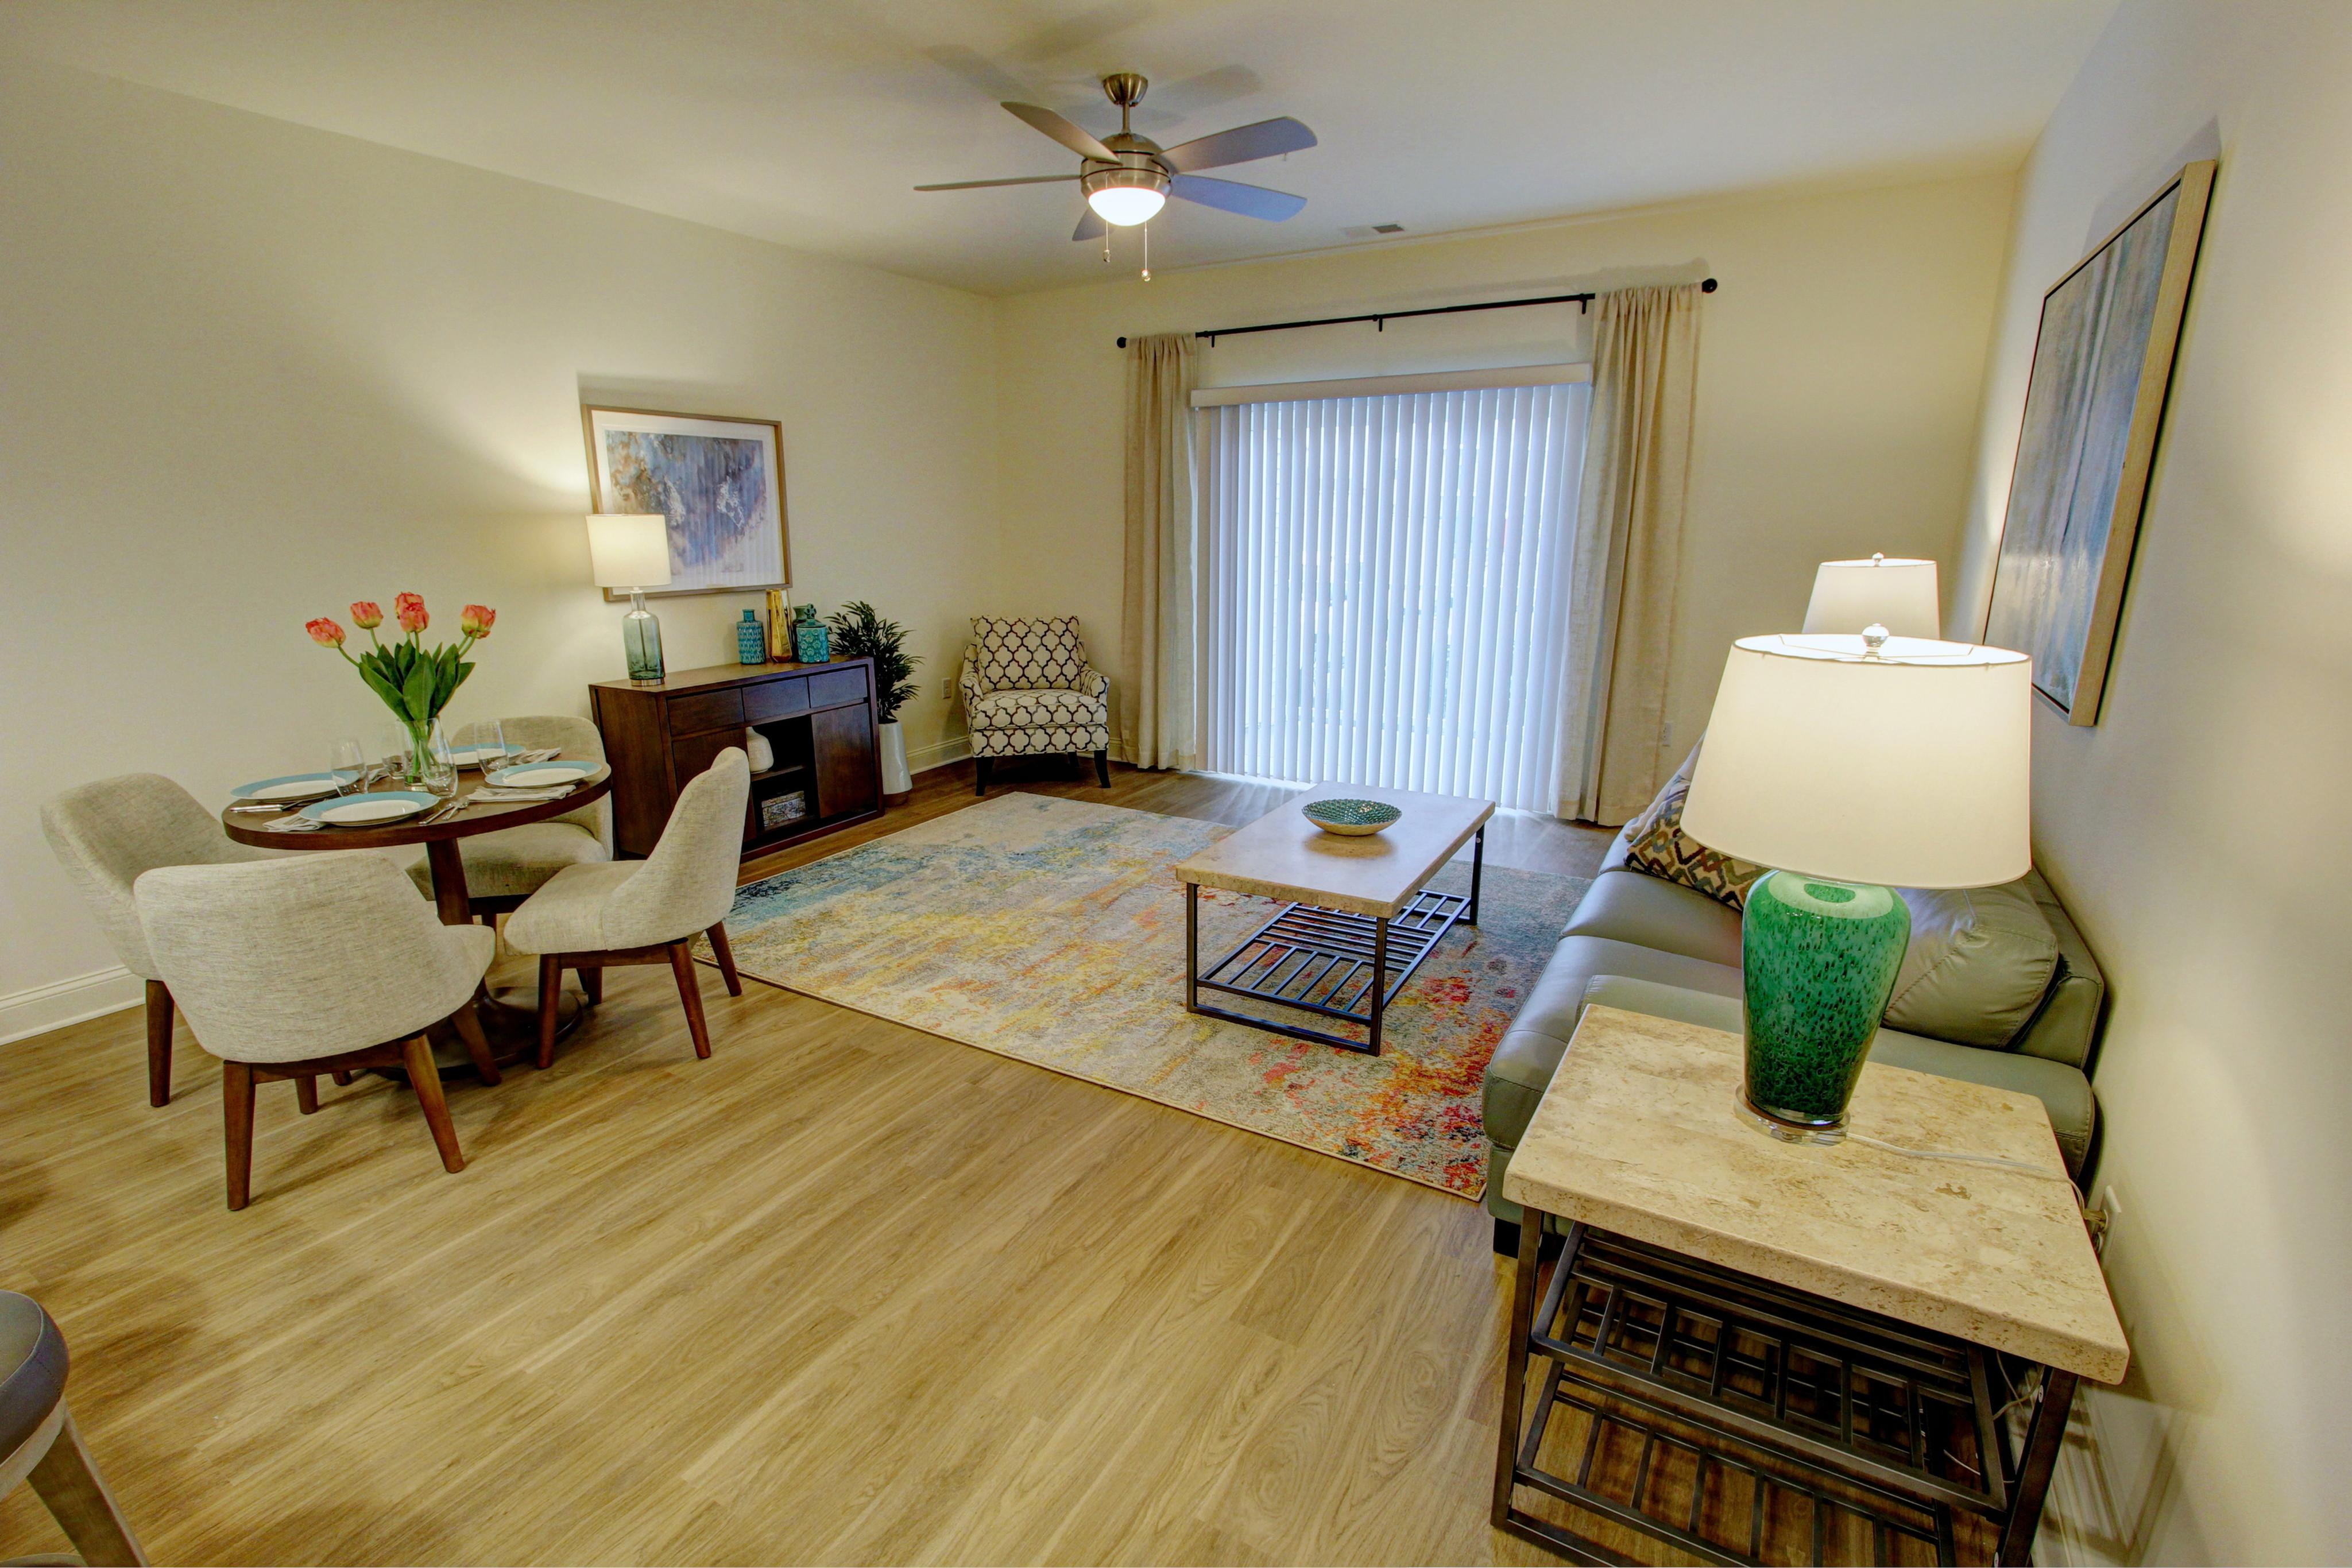 Saratoga apartments